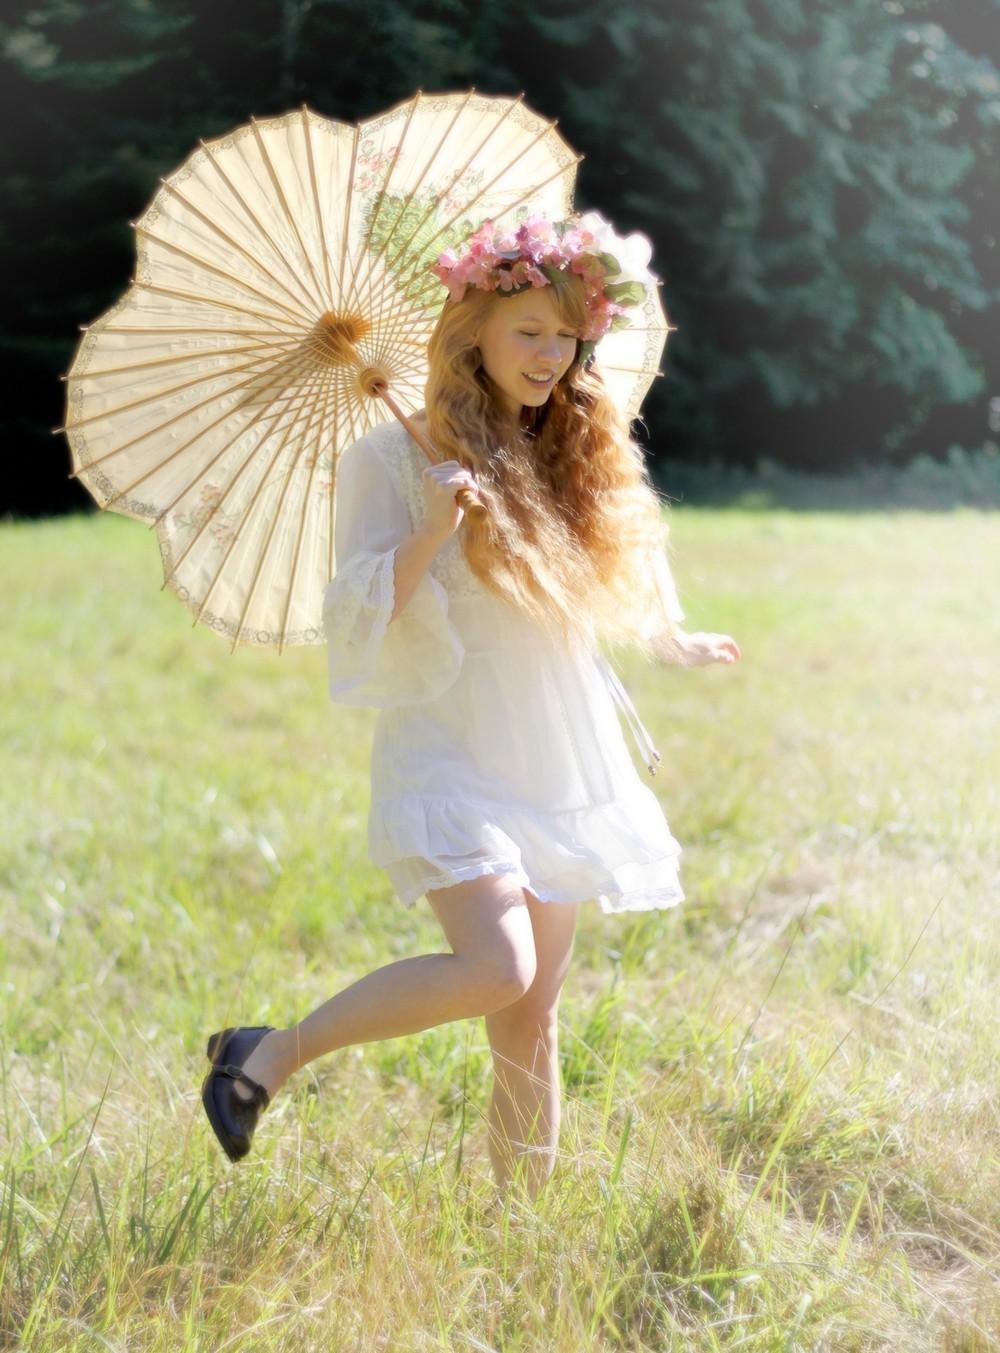 Dolly Little резвится на лужайке